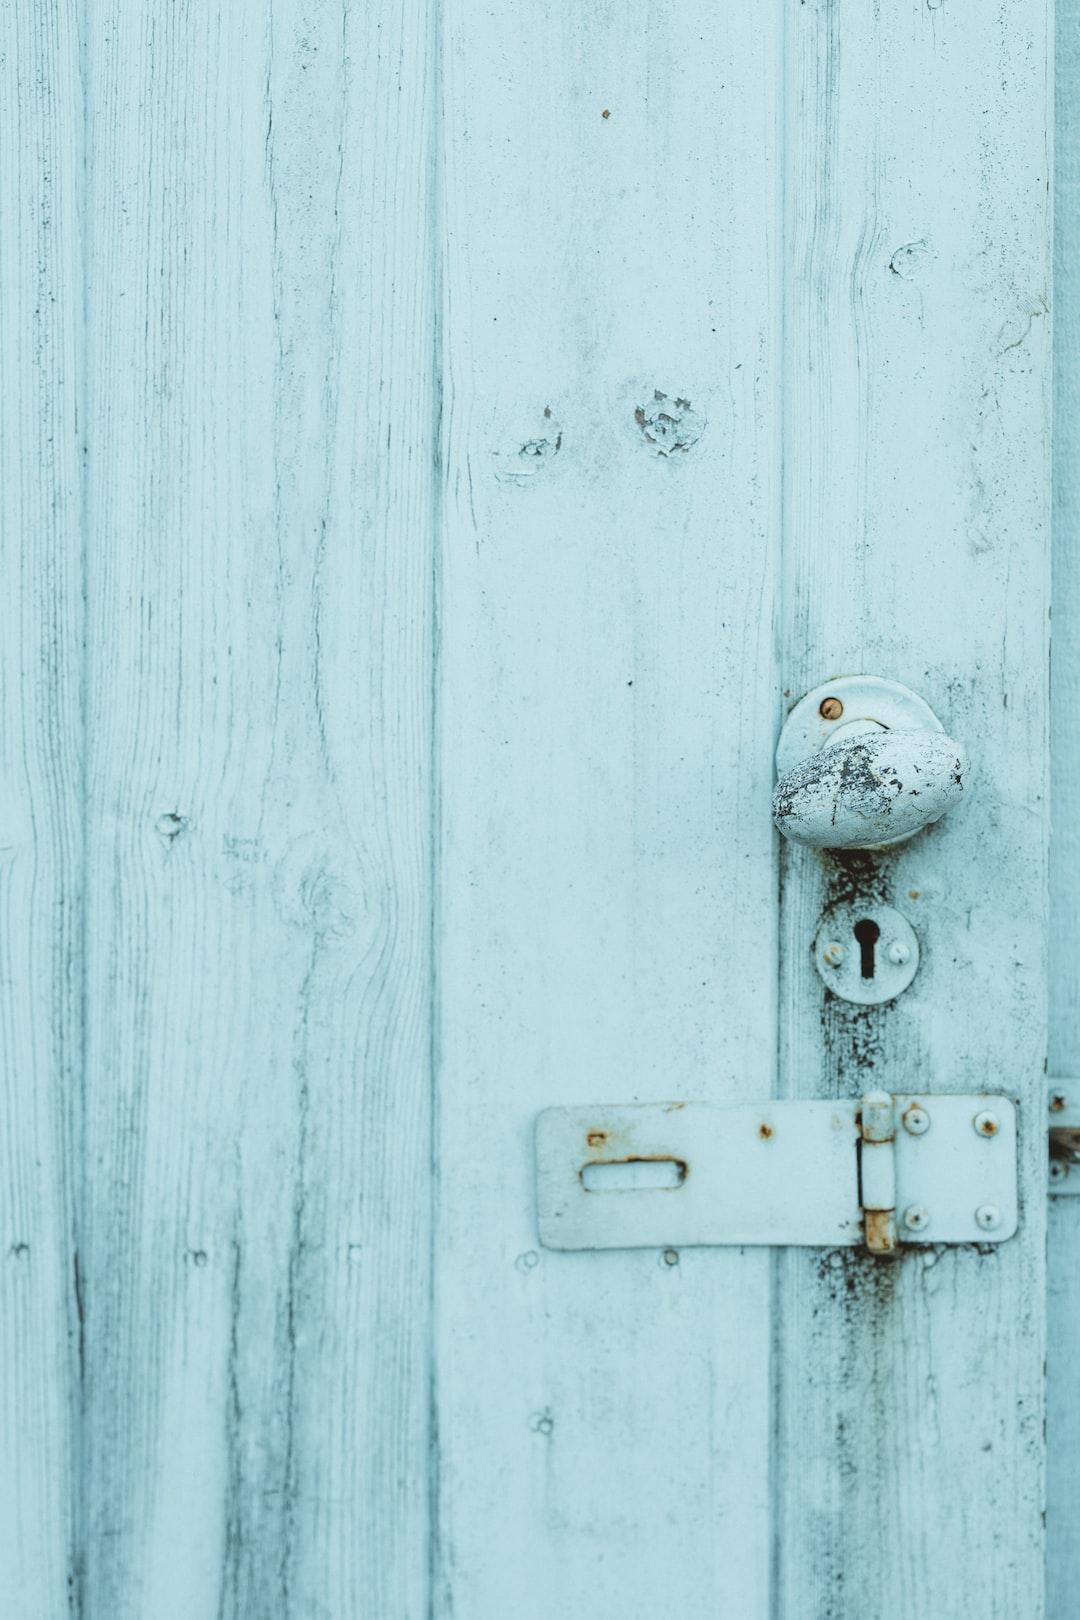 Pale blue distressed door with handle